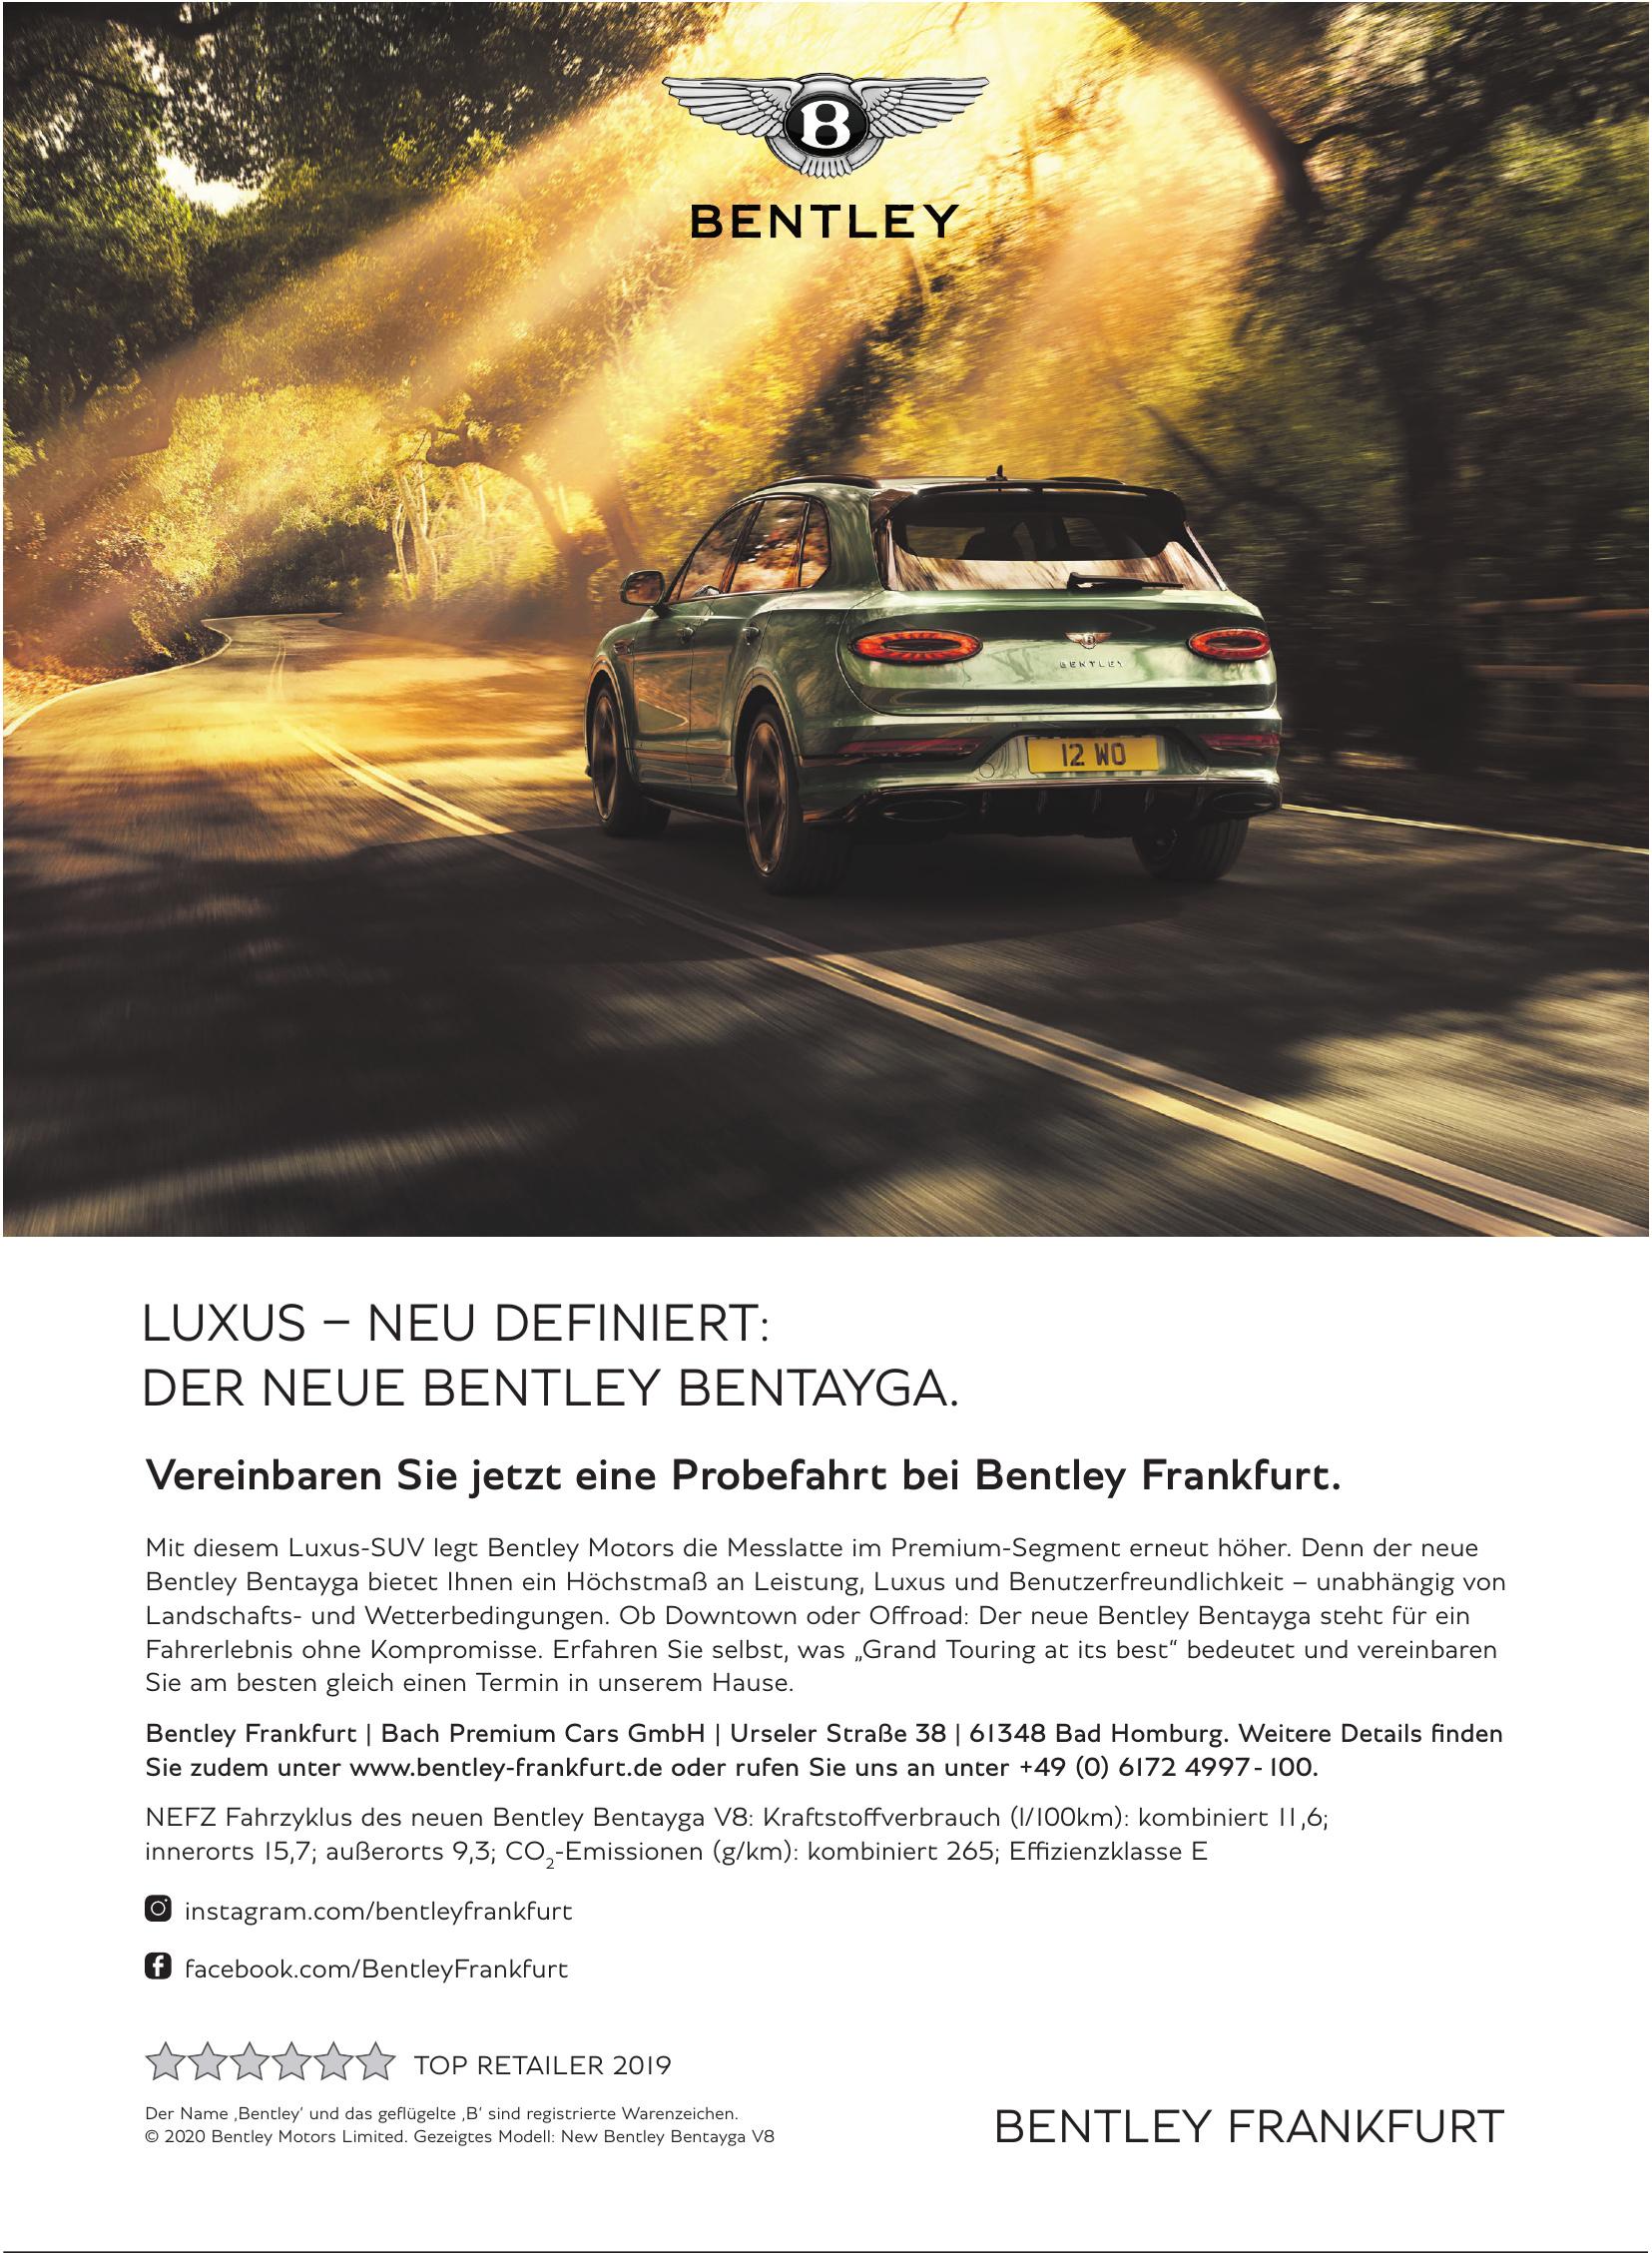 Bentley Frankfurt - Bach Premium Cars GmbH